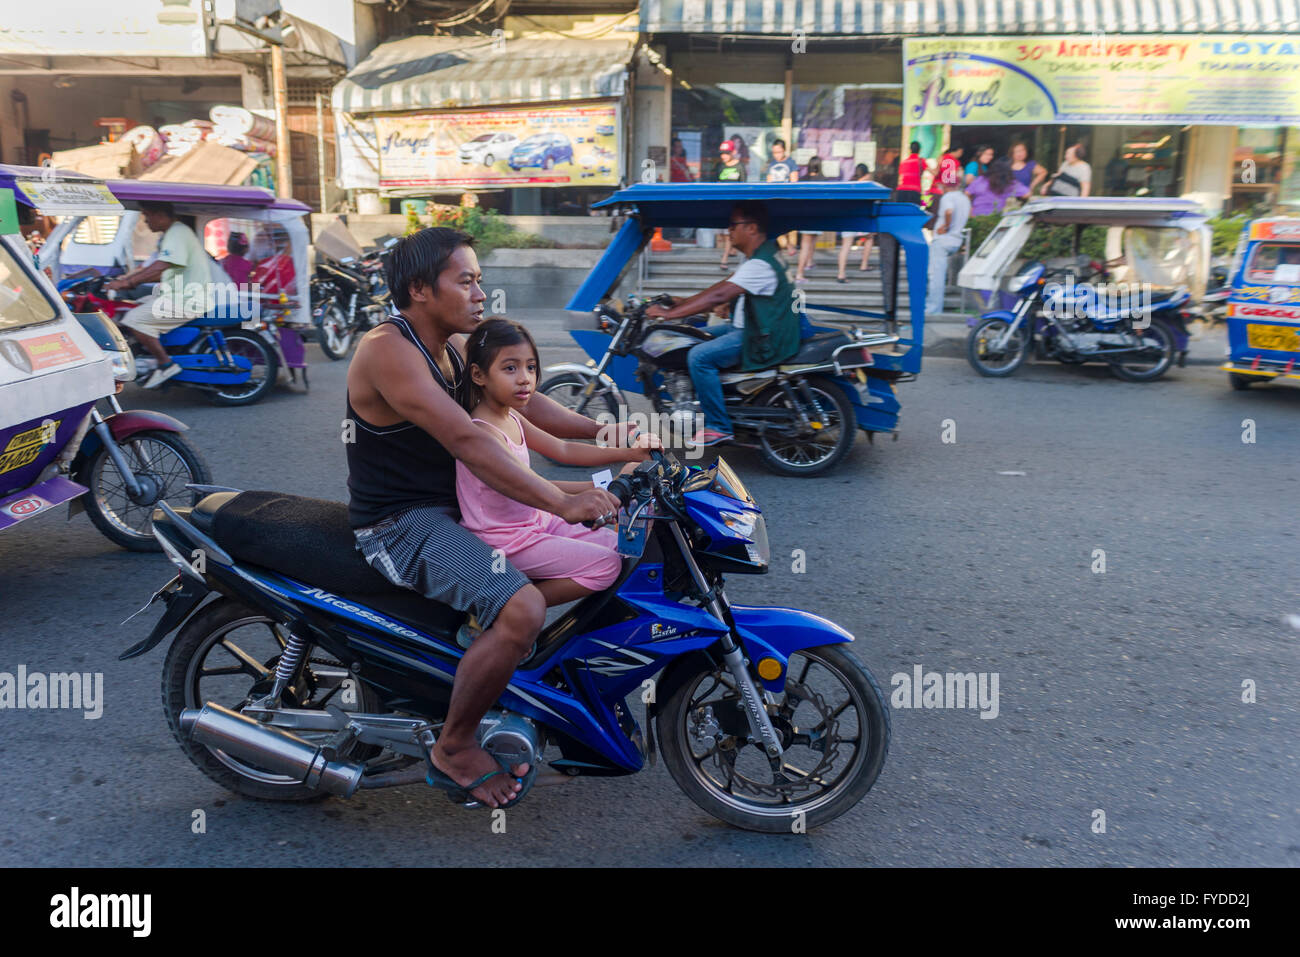 Iloilo City Stock Photos & Iloilo City Stock Images - Alamy